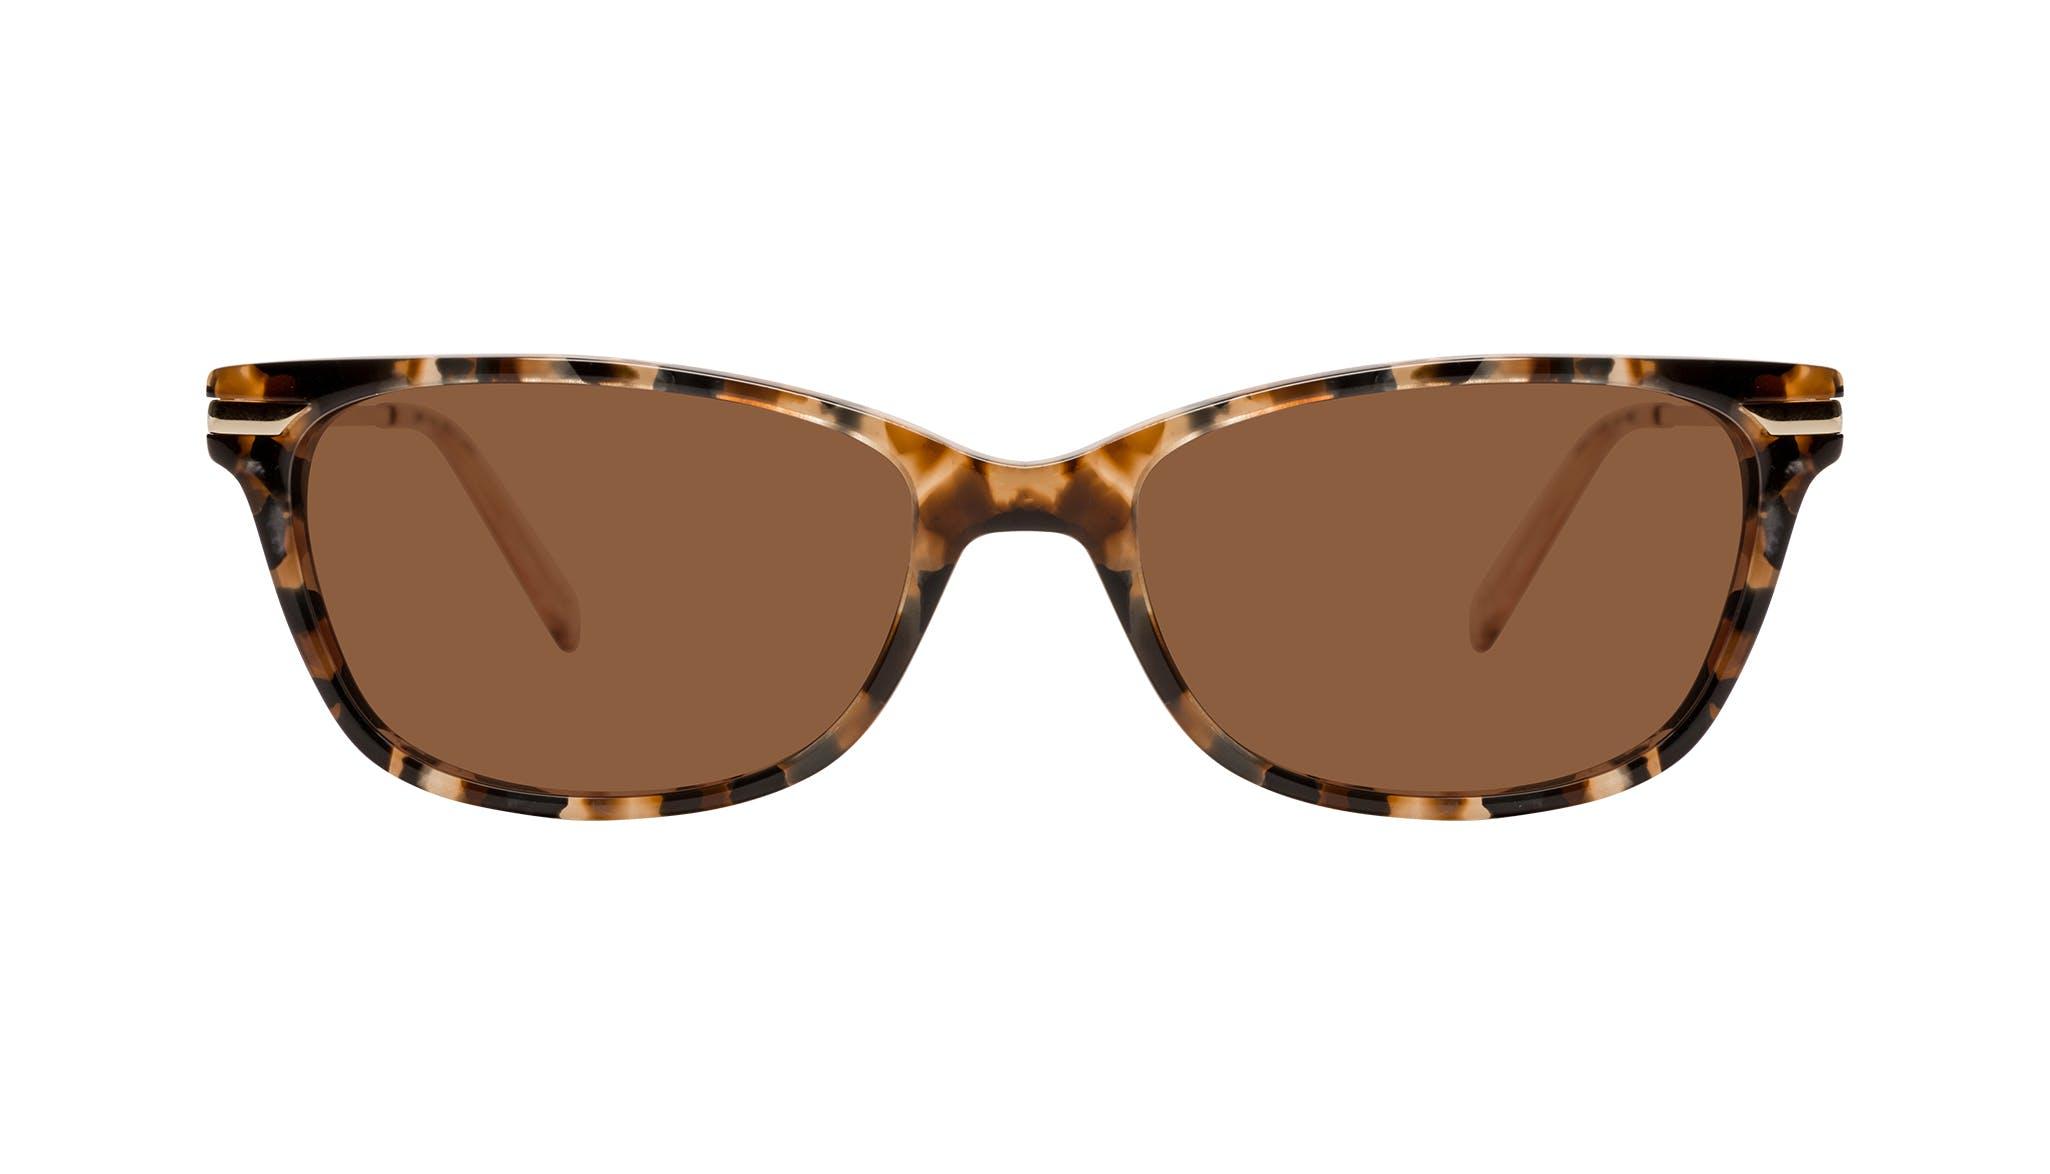 Affordable Fashion Glasses Rectangle Sunglasses Women Comet Plus Gold Flake Front